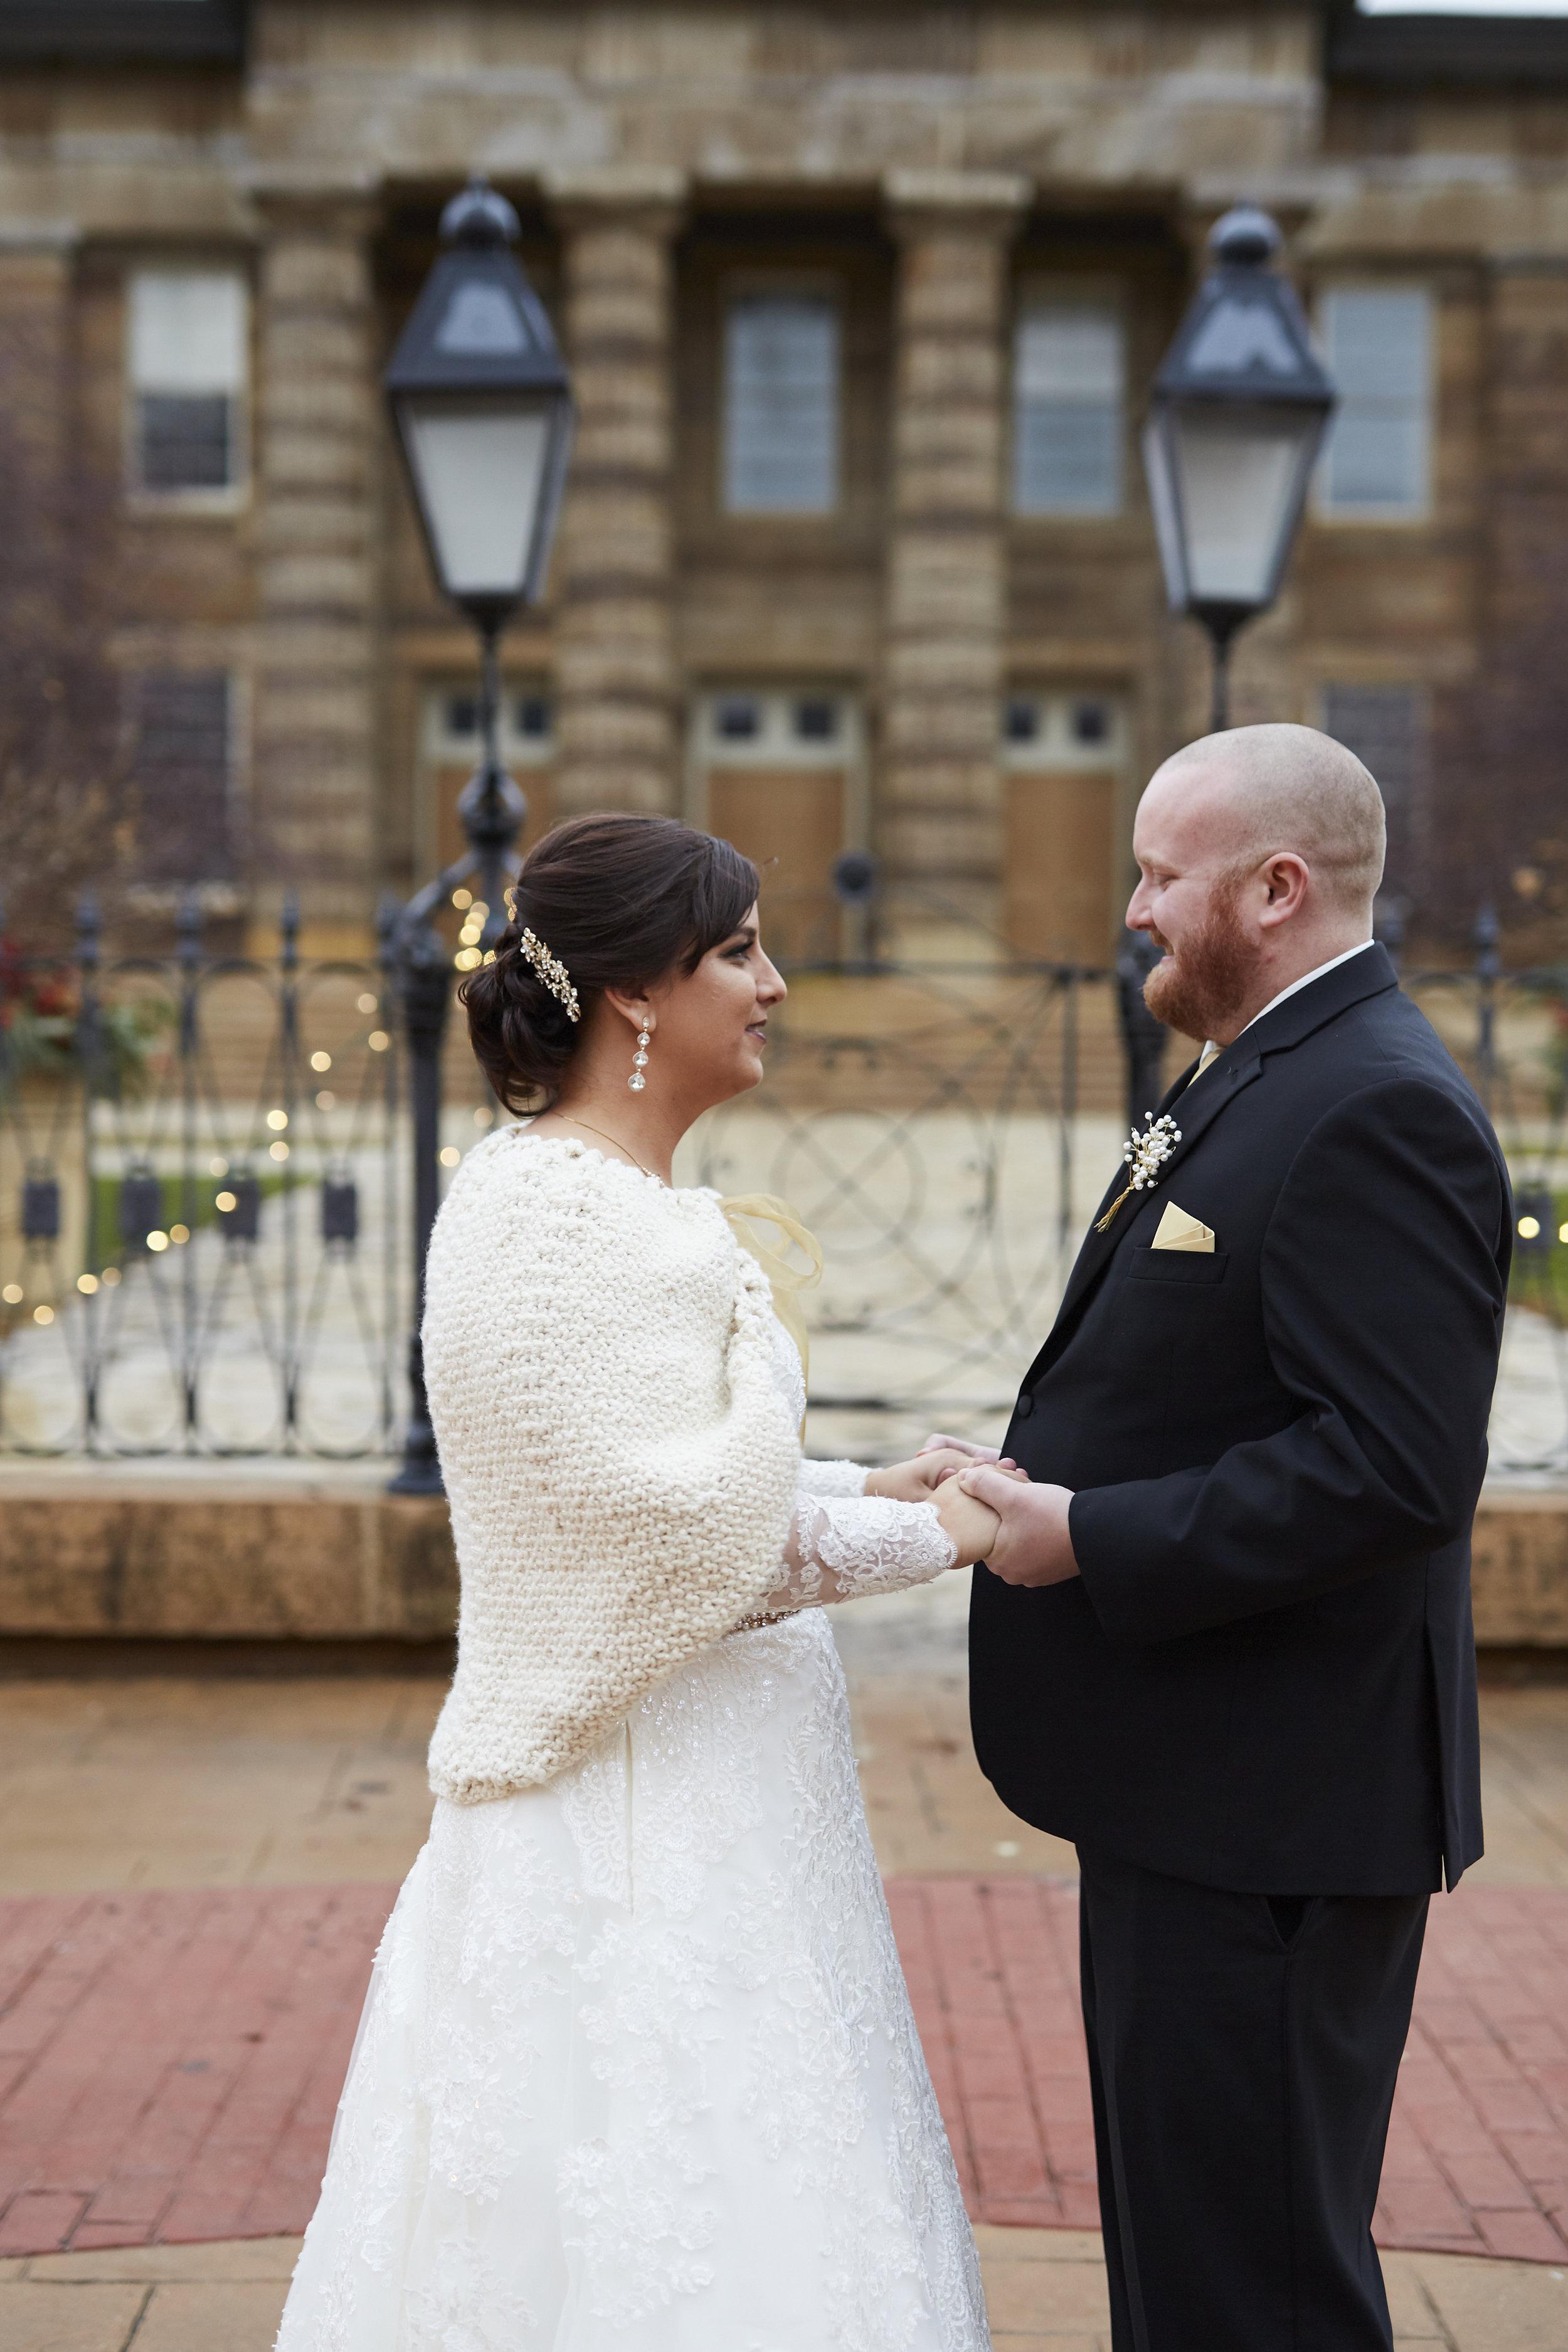 Liz & Josh Wedding -  benromangphoto - 6I5A0682.jpg